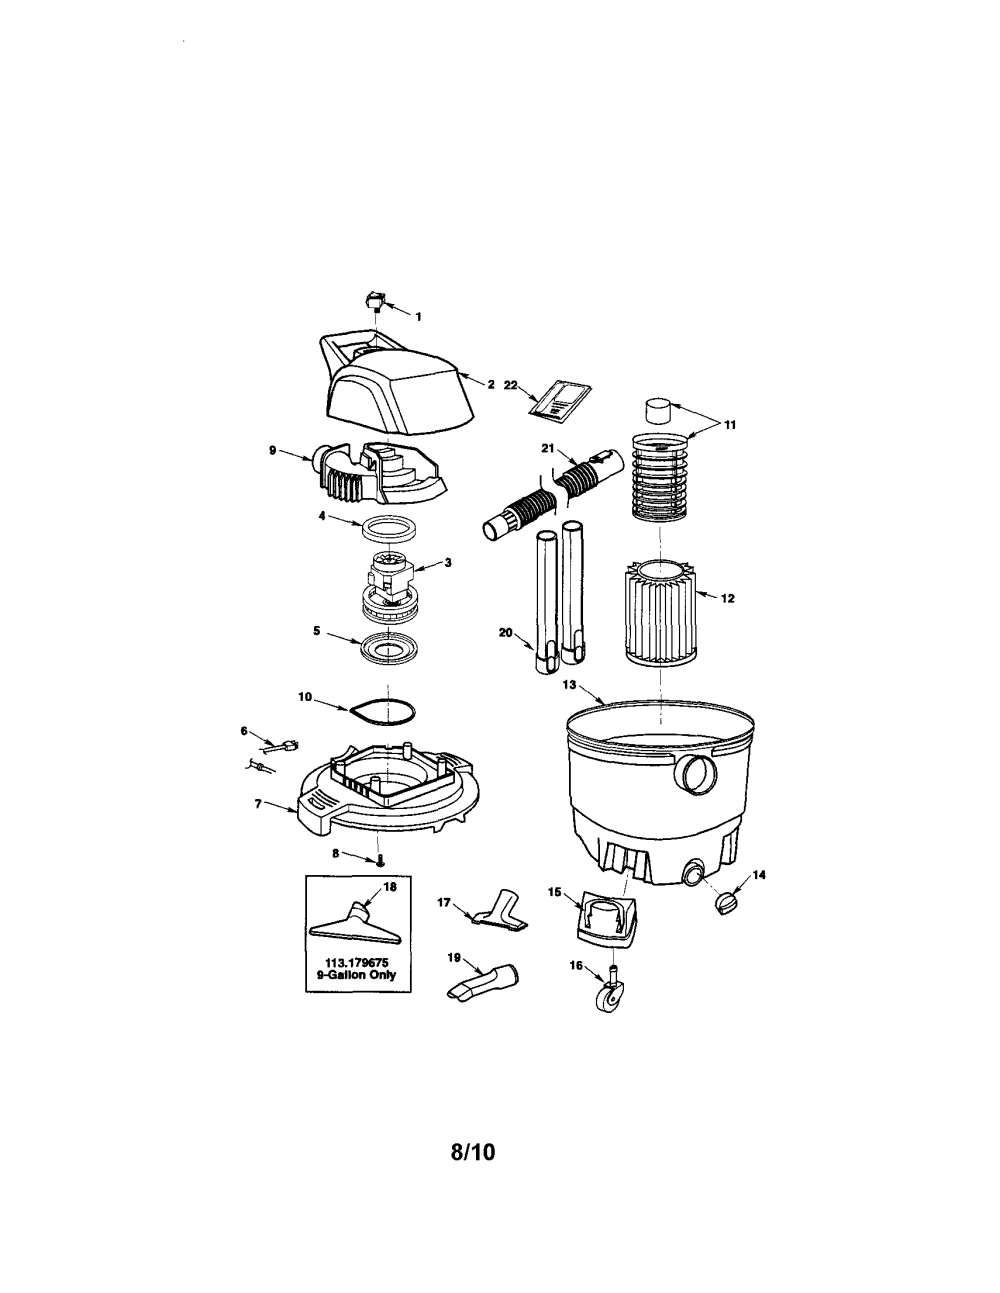 medium resolution of craftsman 113179650 wet dry vac diagram